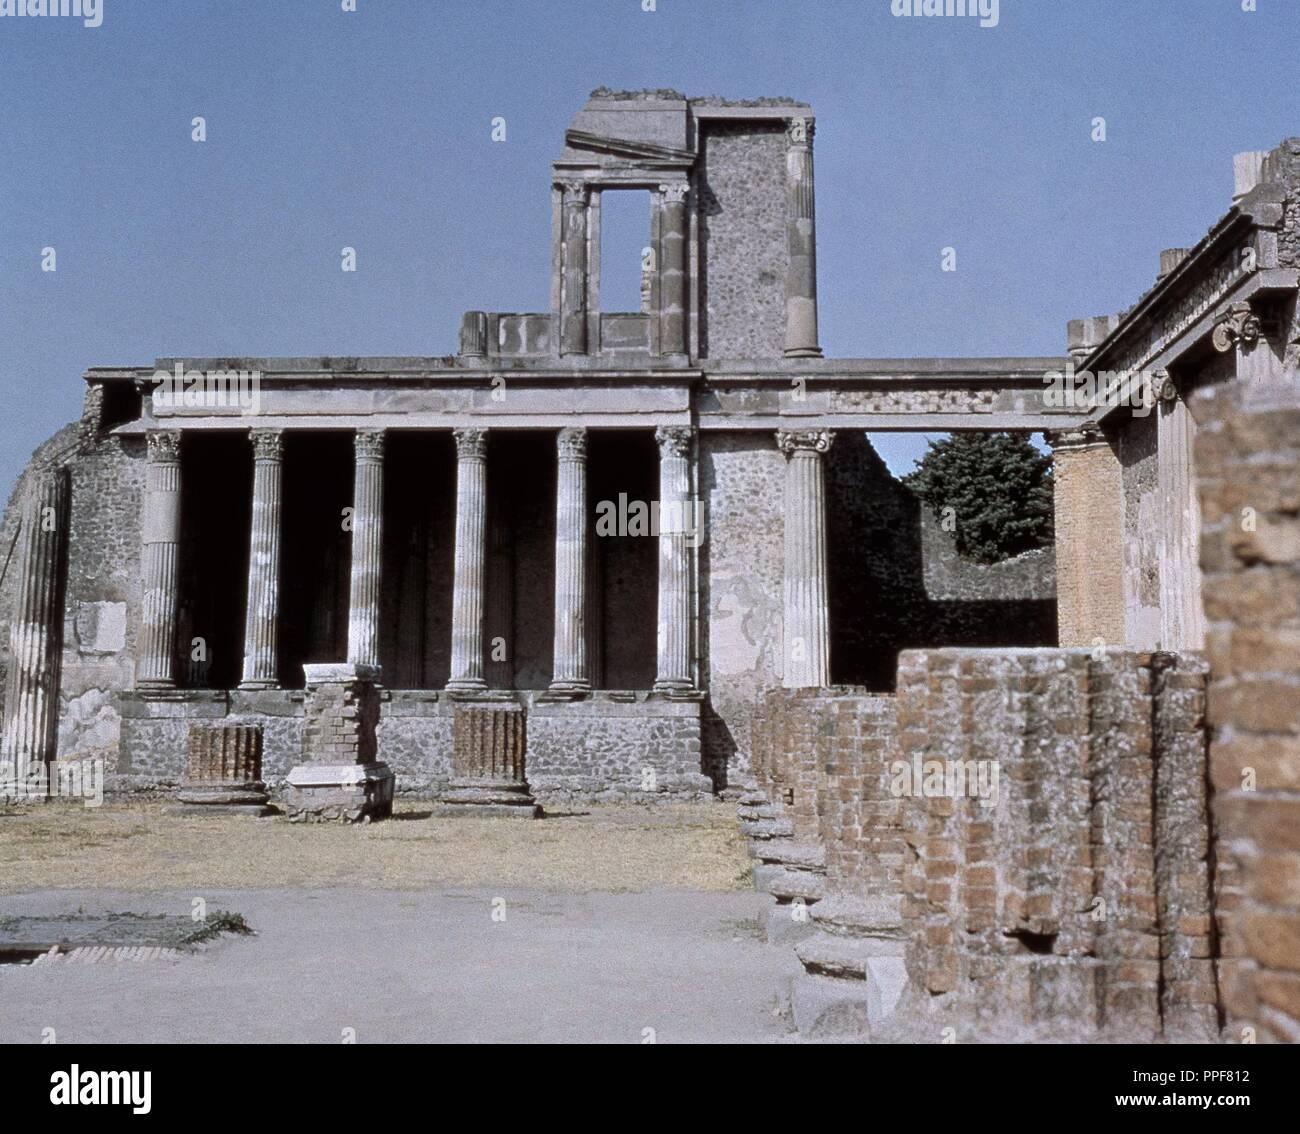 Basilique CONSTRUIDA EN EL AÑO 80 AC- AL FONDO EL TRIBUNAL DE JUSTICIA. Lieu: basilique. ITALIA. Banque D'Images